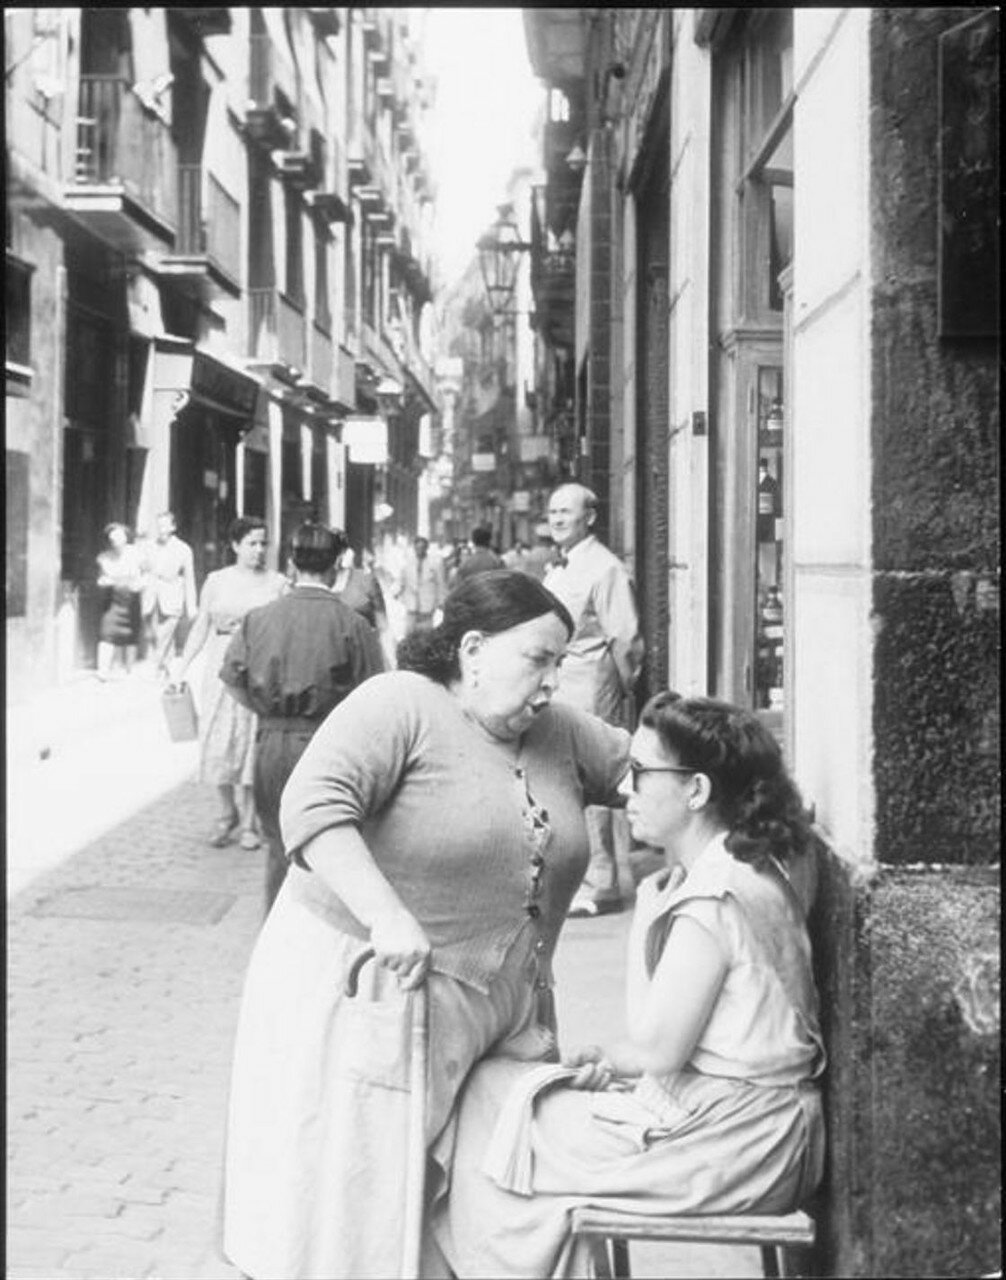 1955. Жоан Миро (художник) на улице Баррио в Барселоне